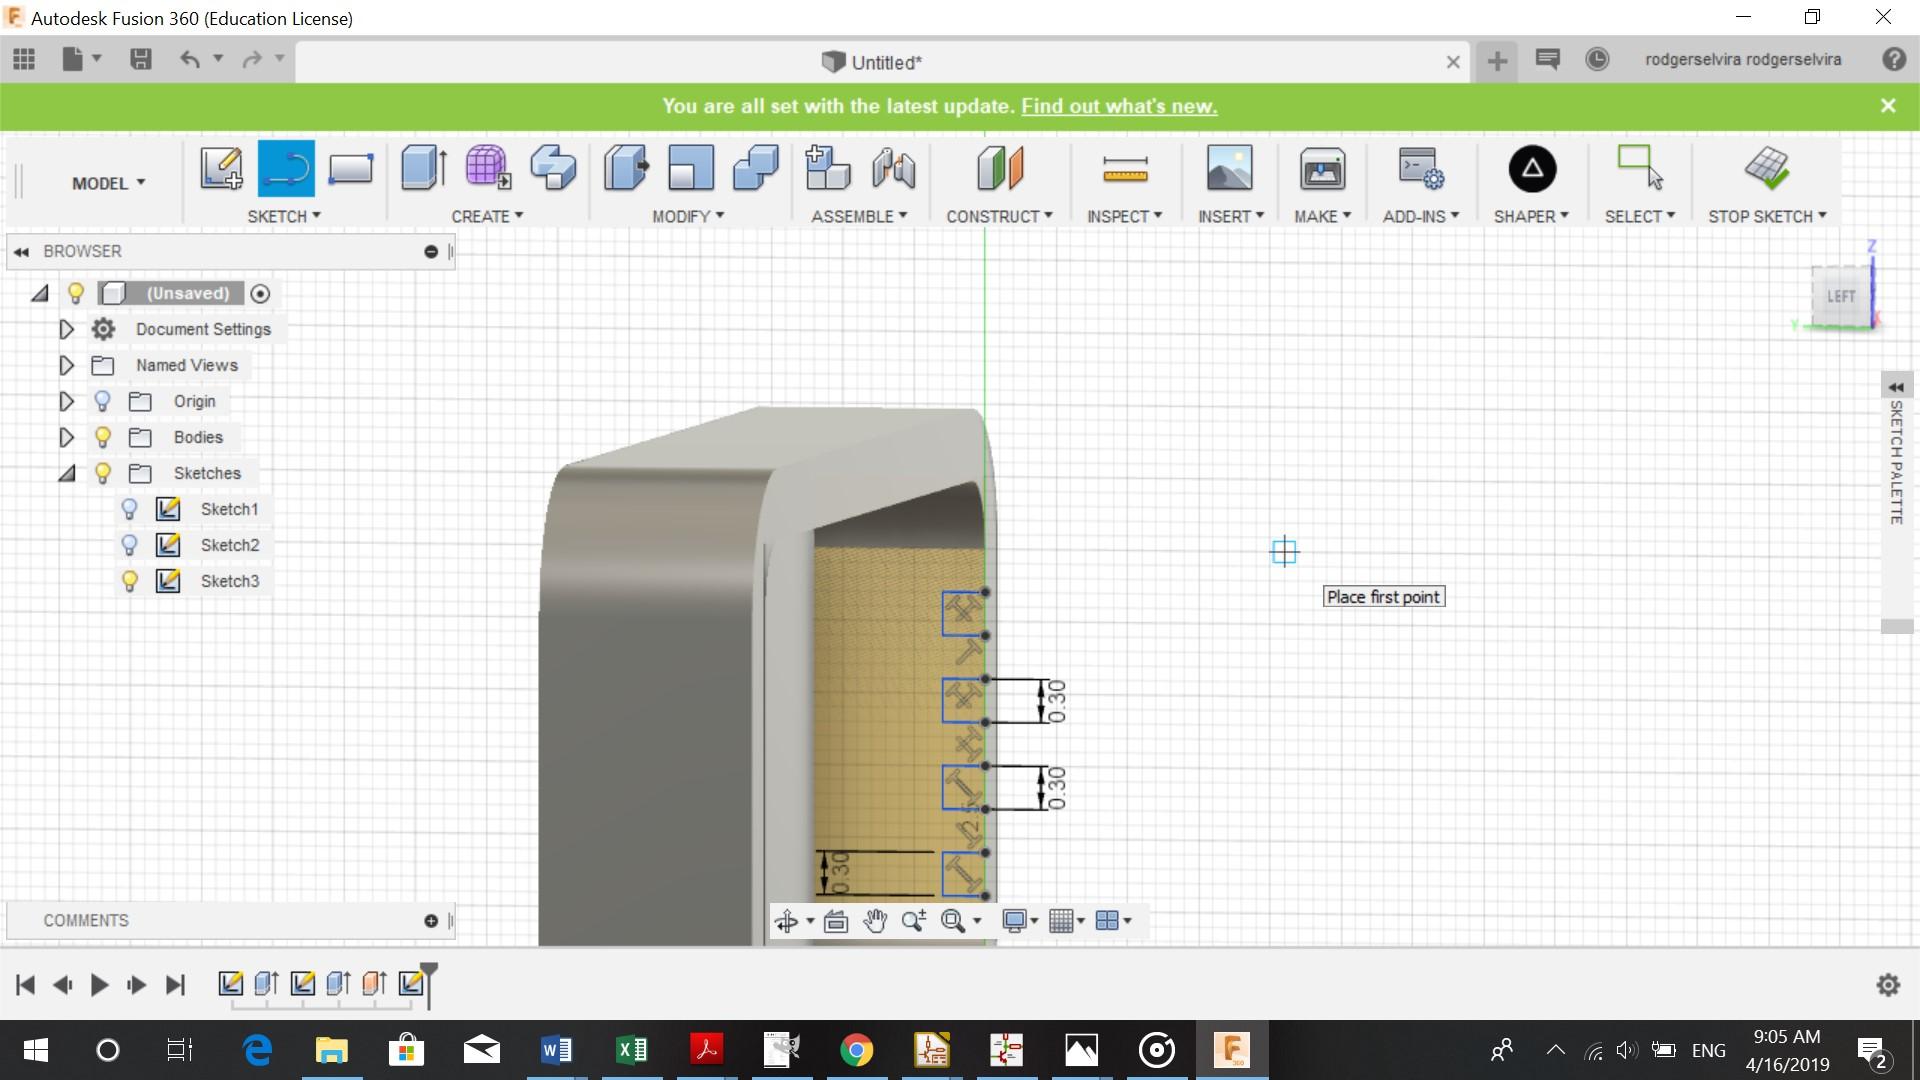 Week 3 Computer Aided design - Elvira Rodgers